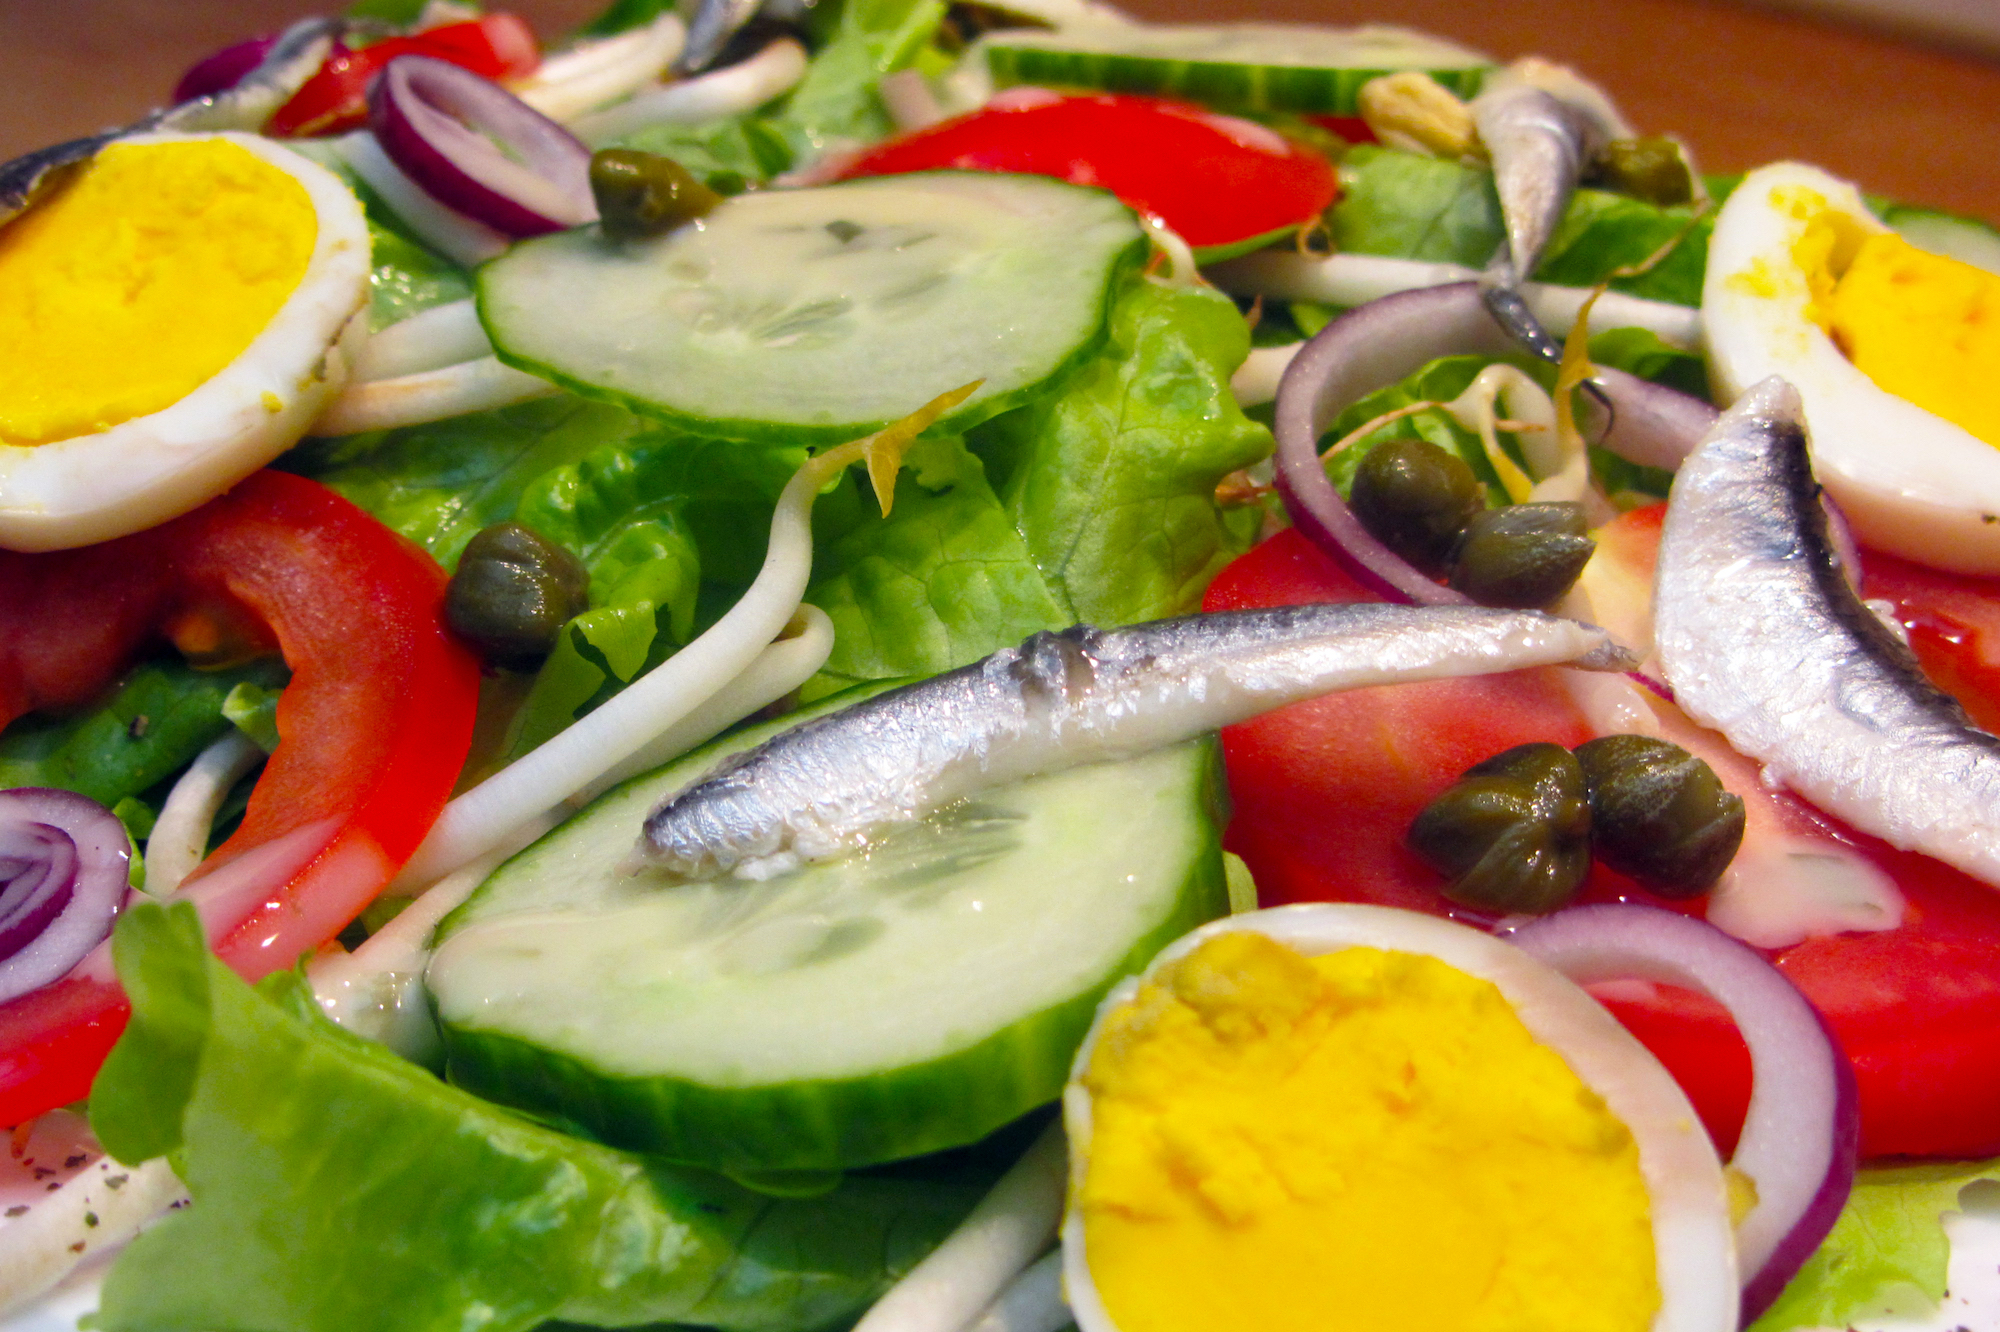 Zacht-zure salade met ansjovis en sojascheuten